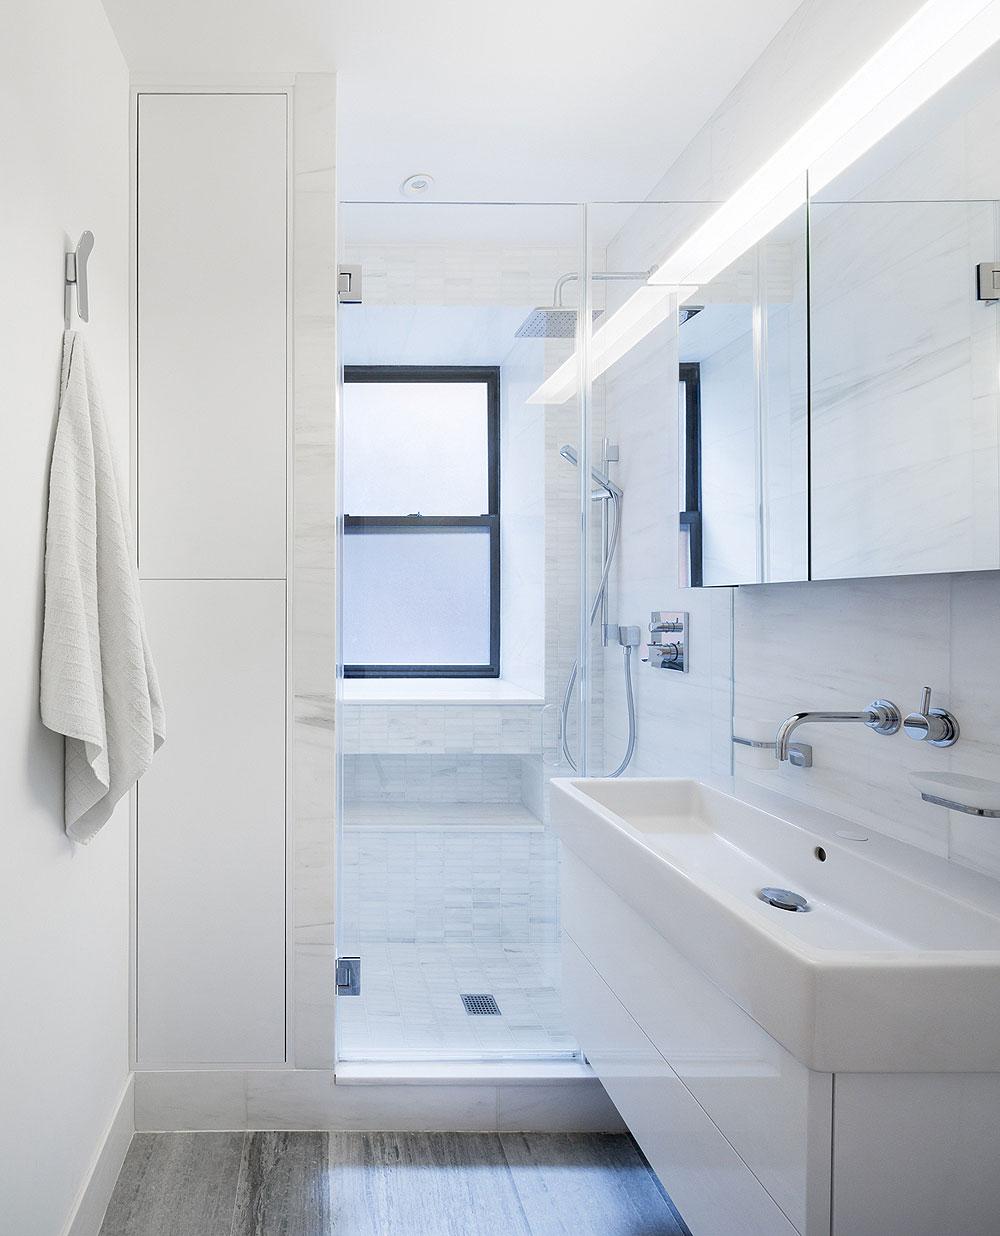 reforma-apartamento-new-york-kane-architecture (6)